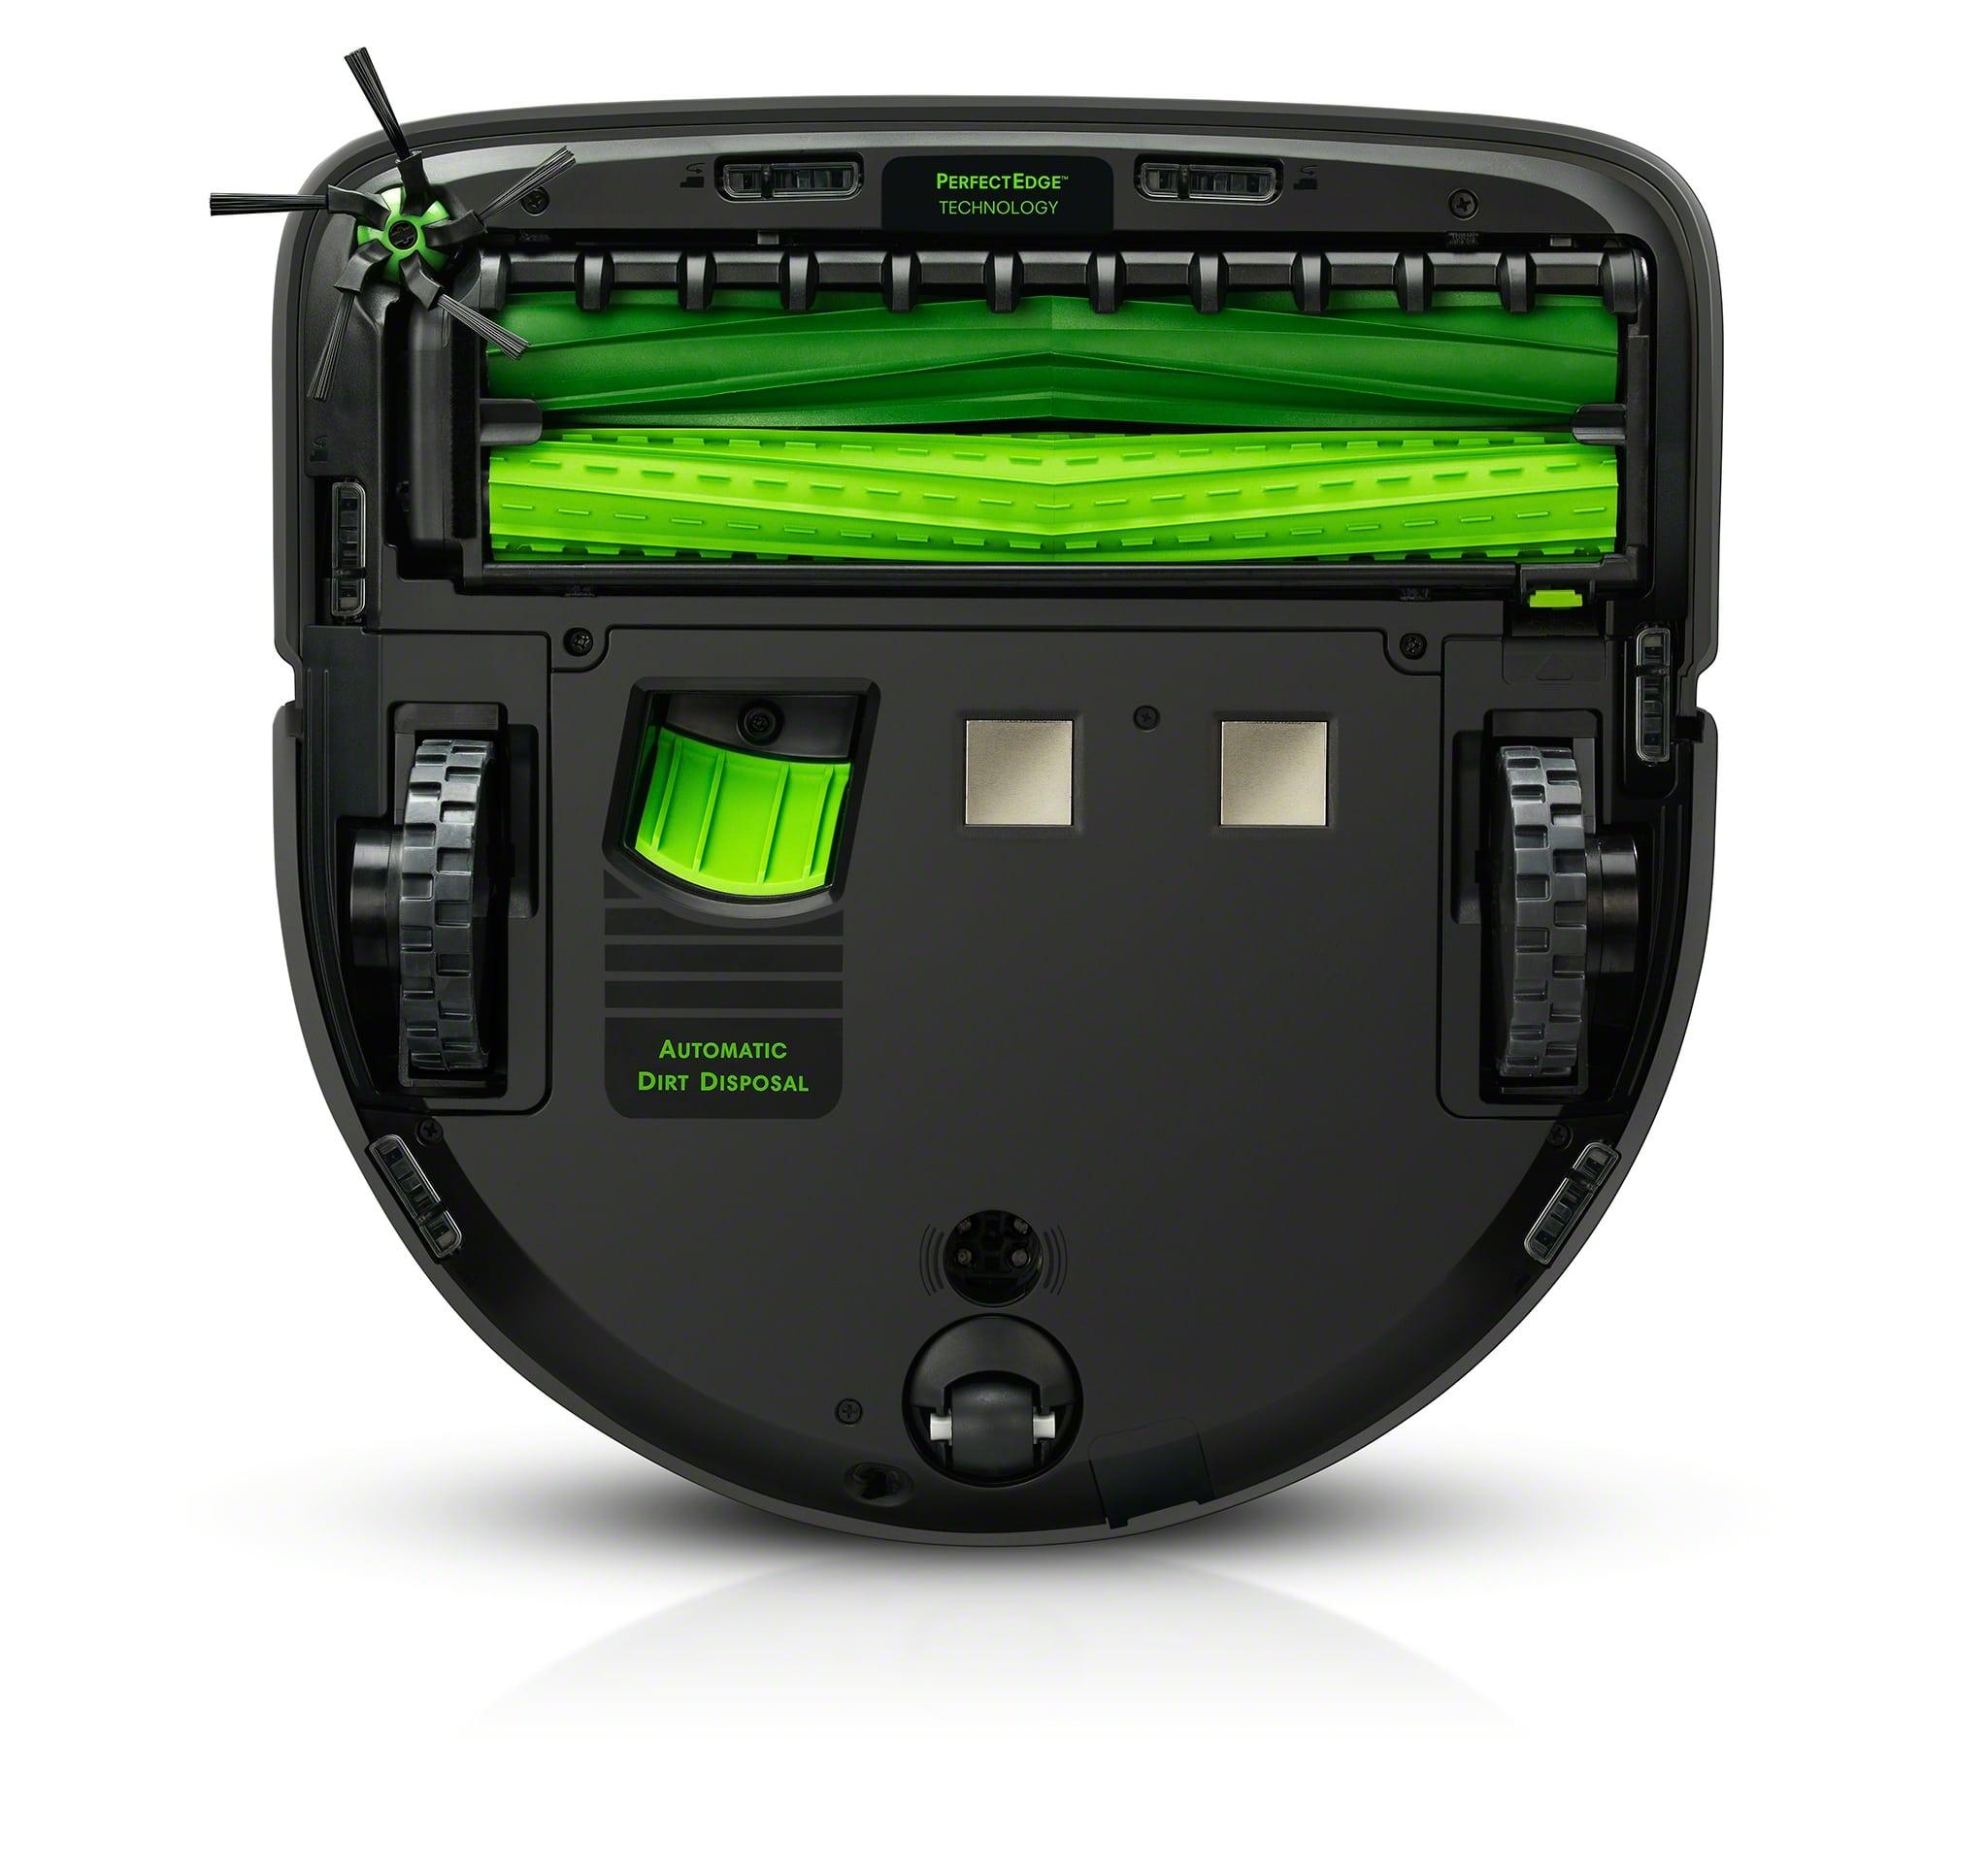 Roomba s9_Underside